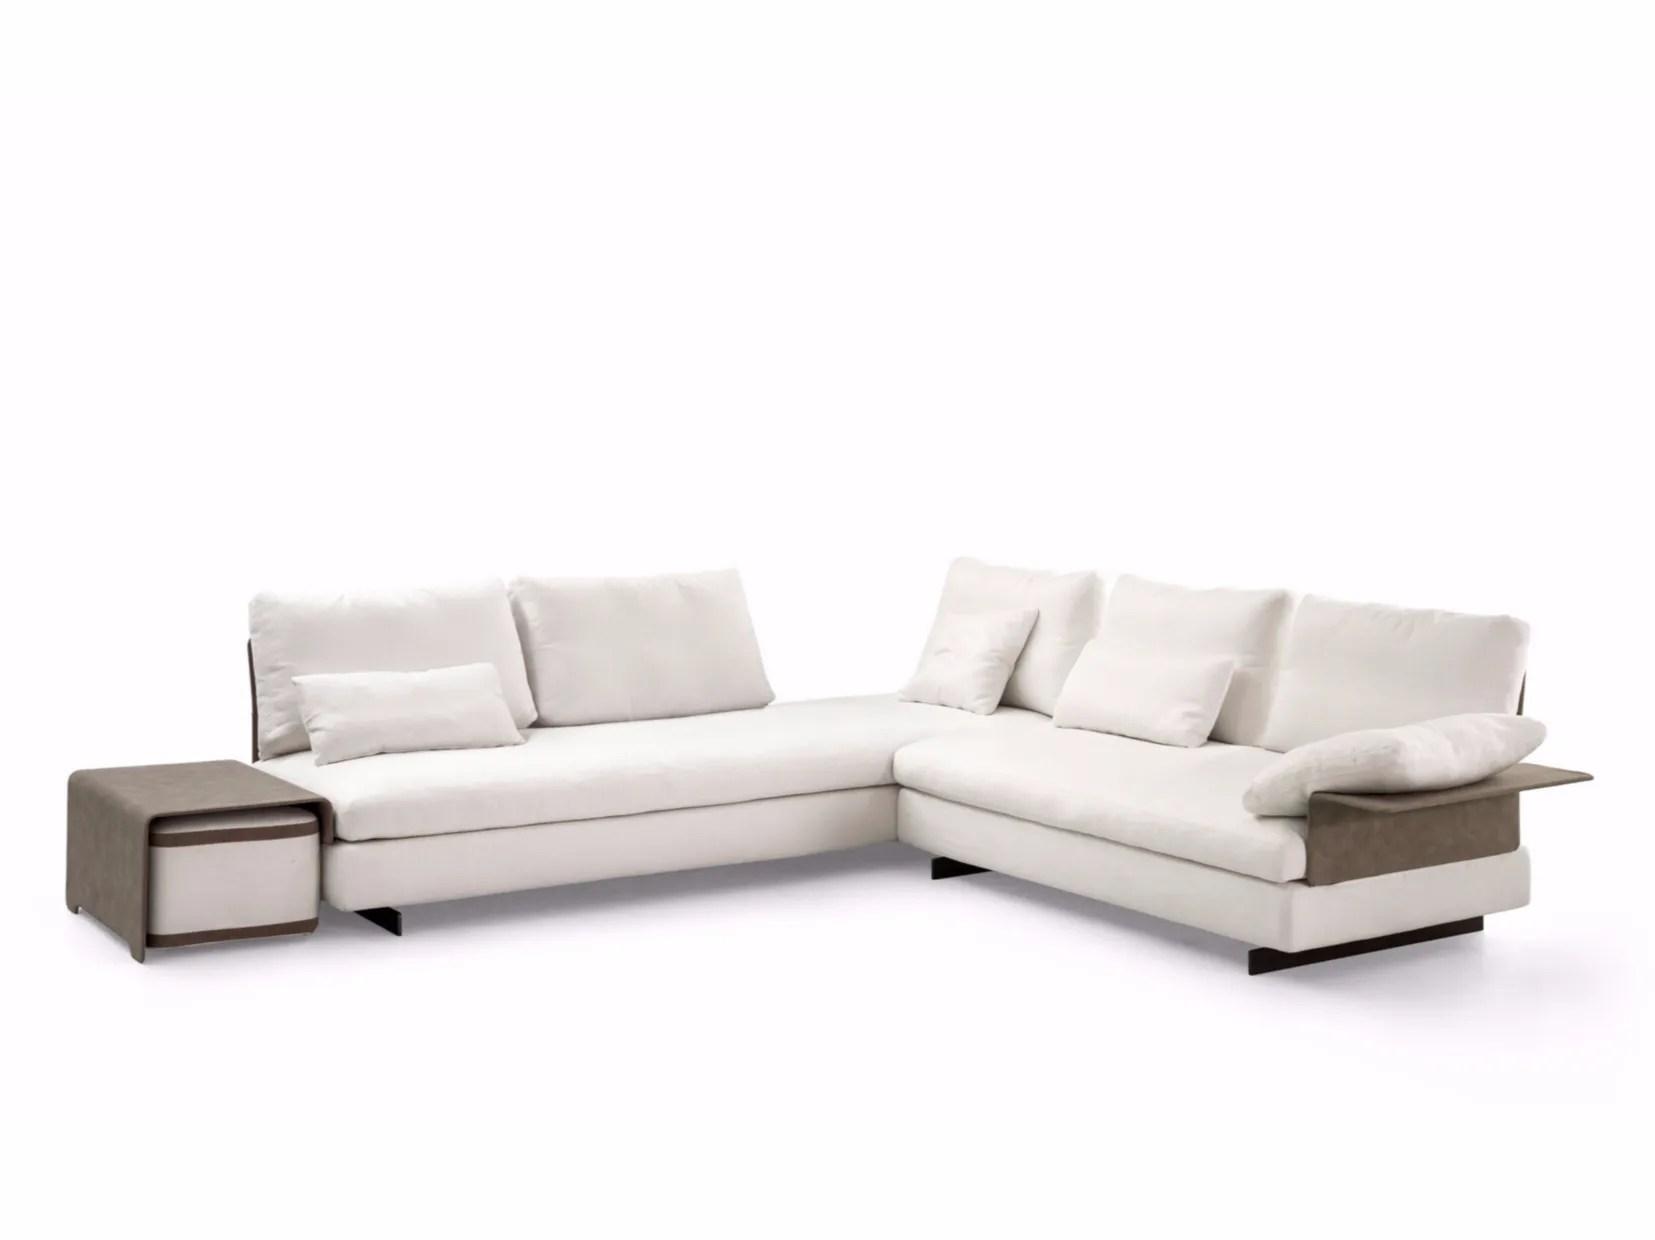 corner sofa cover design milton green madrid futon bed with cup holder gossip by bonaldo sergio bicego